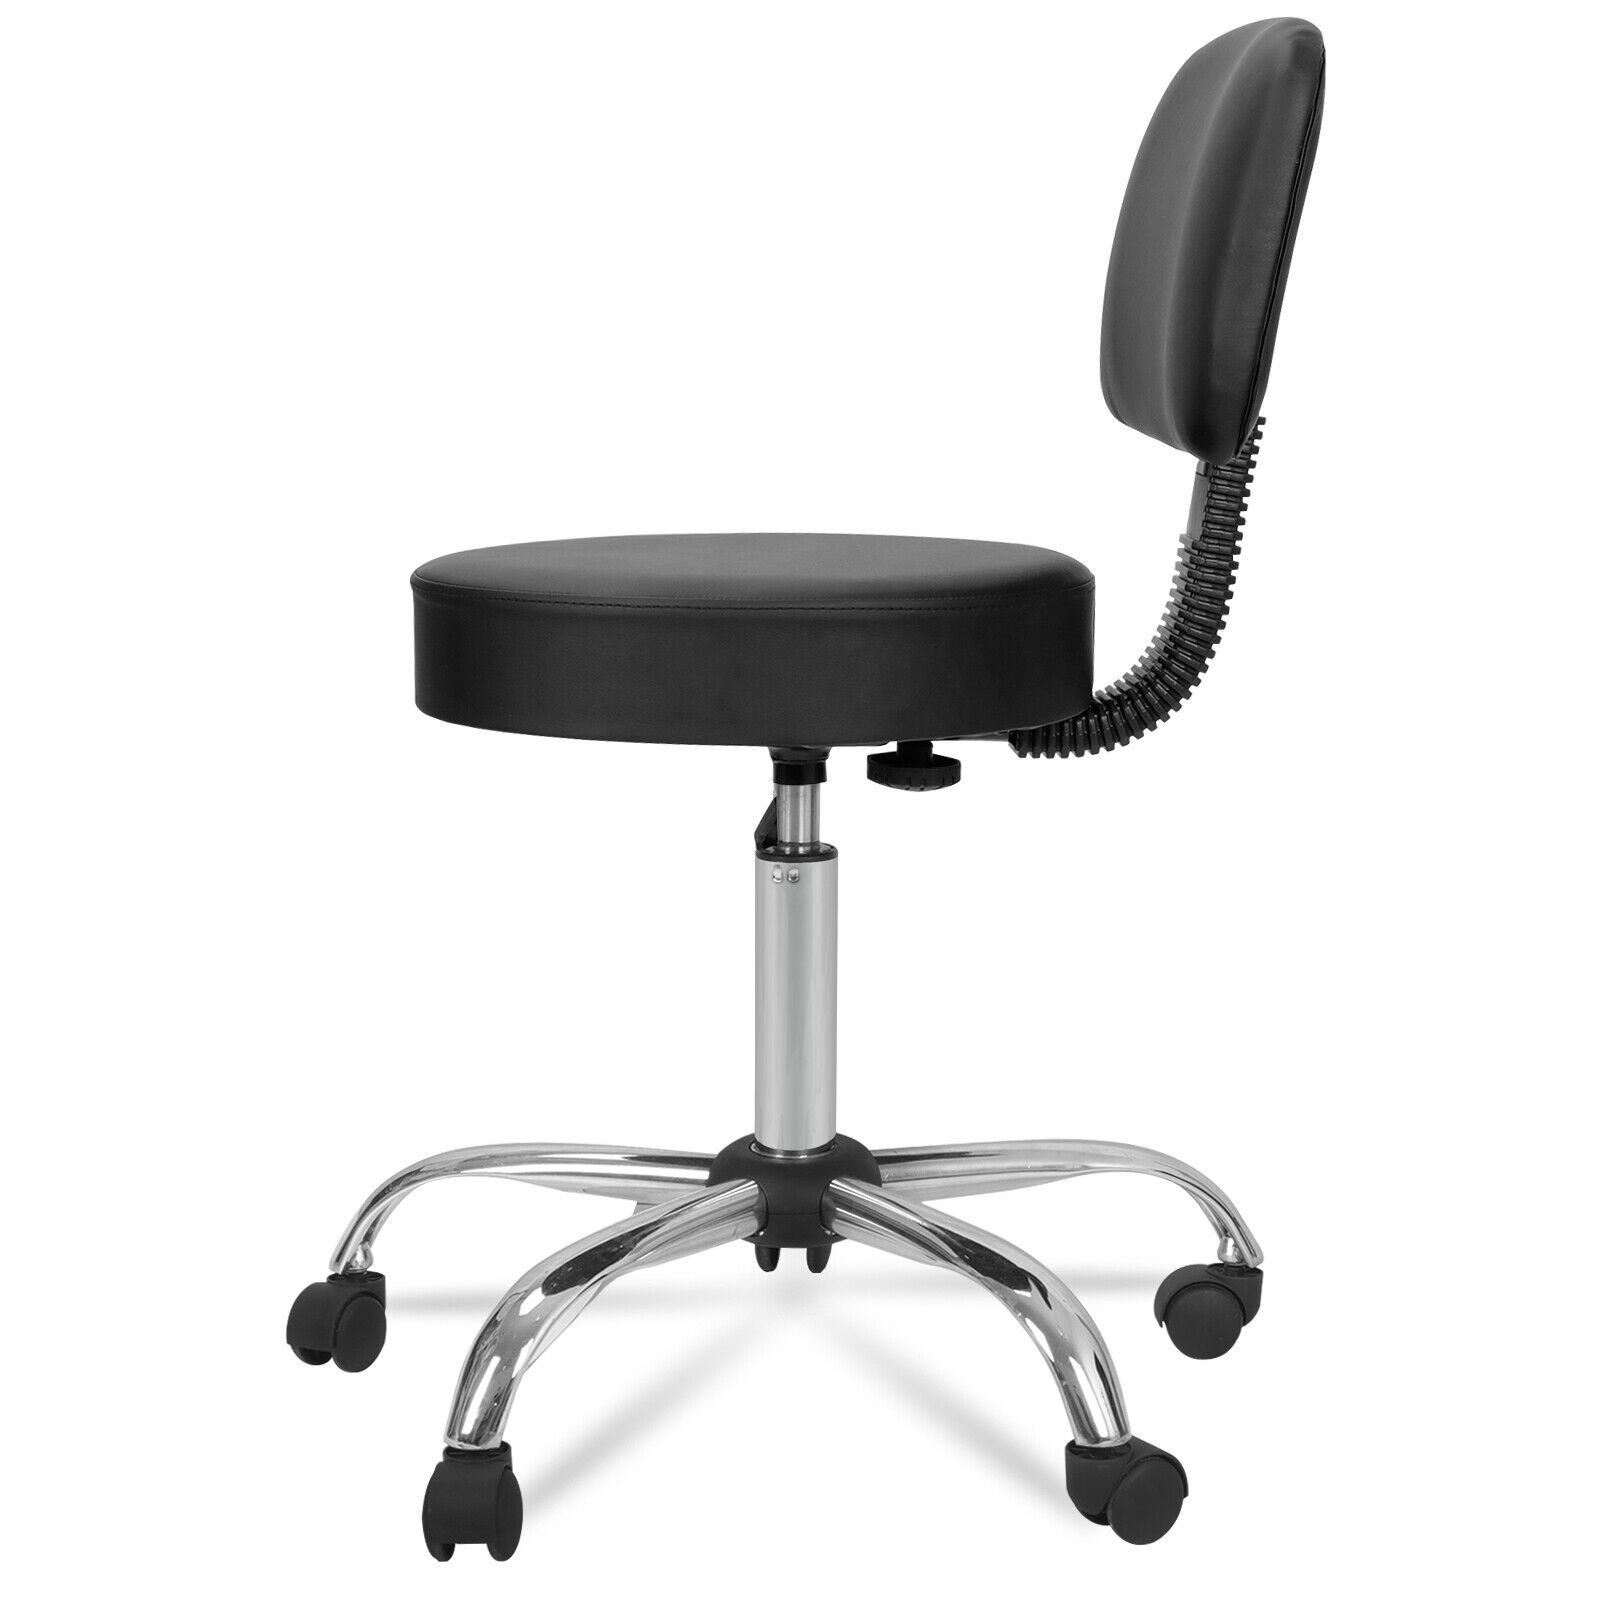 3X Adjustable Salon Stool Hydraulic Rolling Chair Facial Massage Spa W/Back Rest Health & Beauty